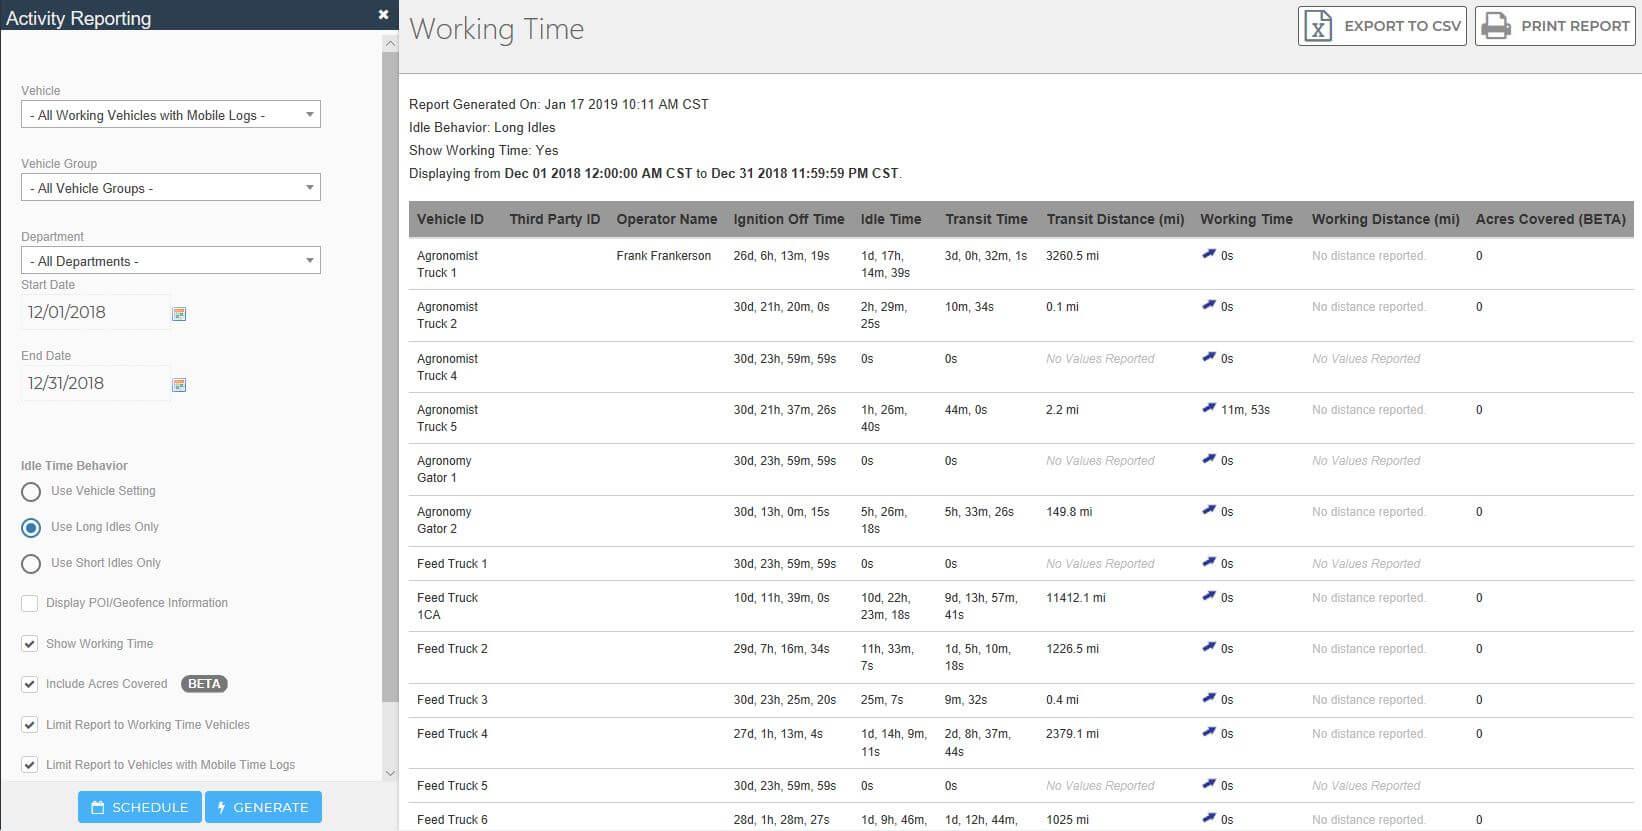 Screenshot of vehicle activity reporting on Razor Tracking's fleet management platform